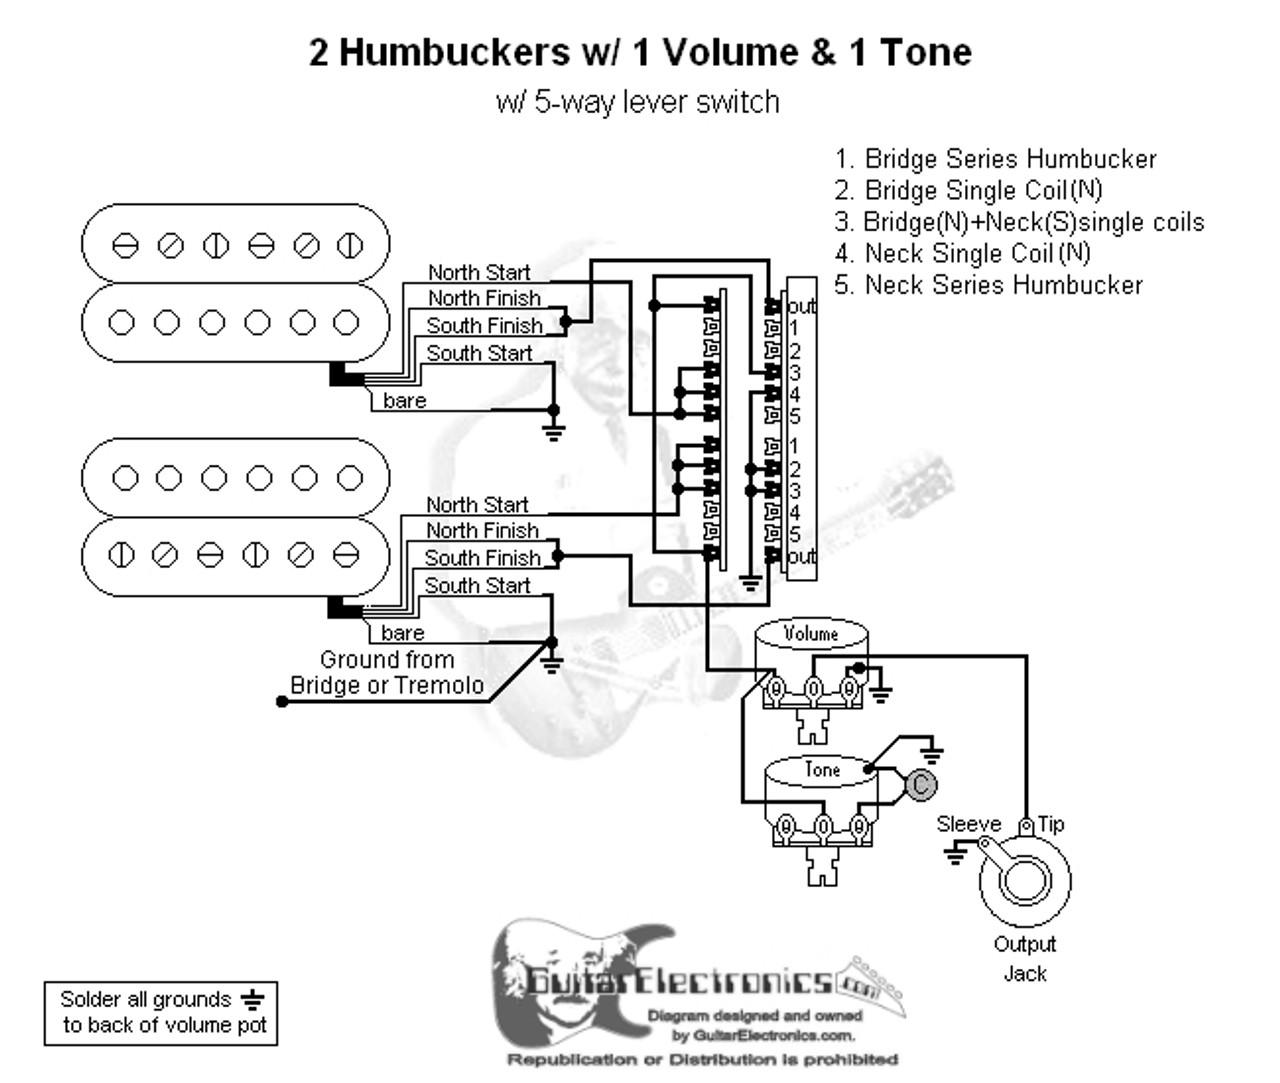 hight resolution of 2 humbuckers 1 vol 1 tone 5 way super switch wiring diagram schema2 humbuckers 5 way lever switch 1 volume 1 tone 01 2 humbuckers 1 vol 1 tone 5 way super